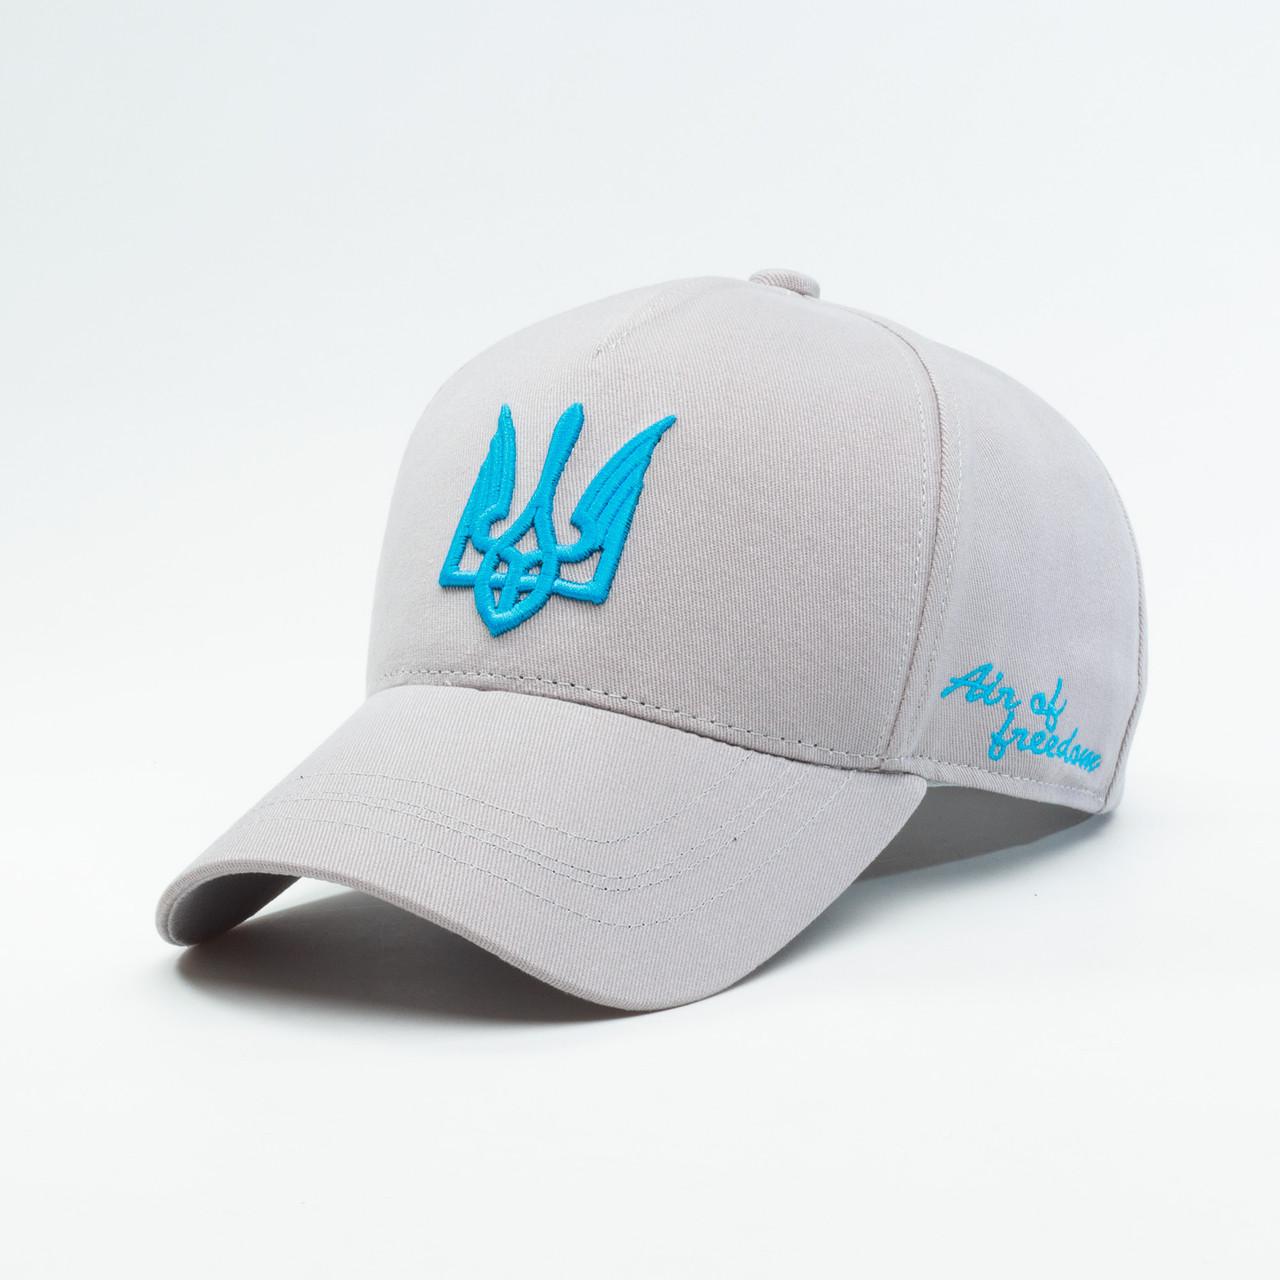 Купить Кепка бейсболка мужская INAL air of freedom XL / 59-60 RU Серый 37559